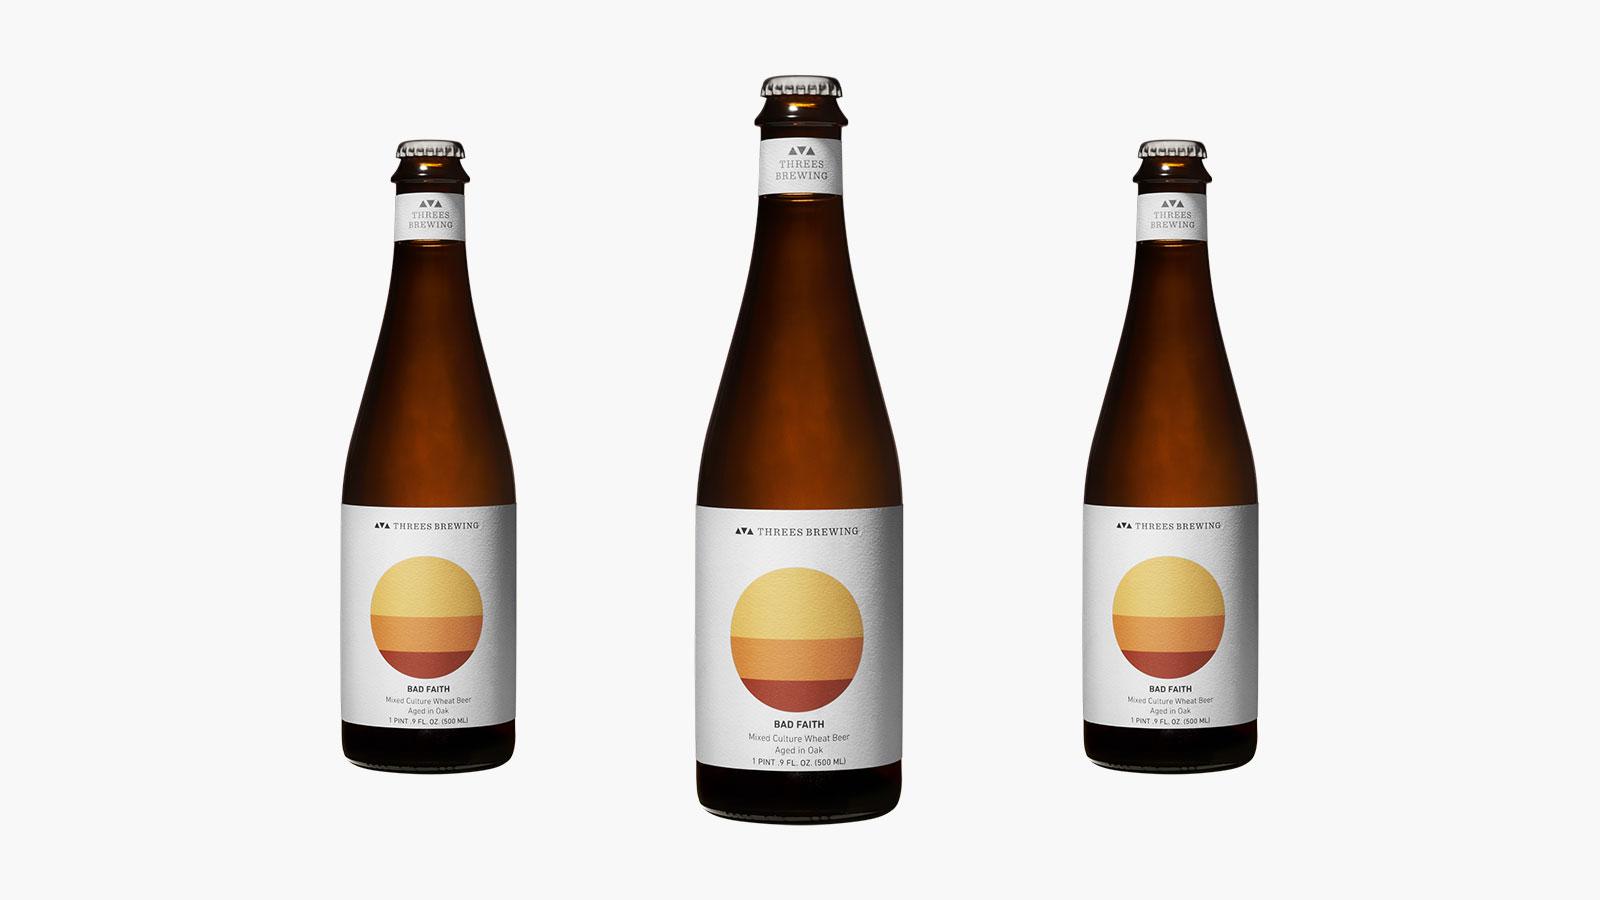 Threes Brewing Barrel Aged Bad Faith Beer